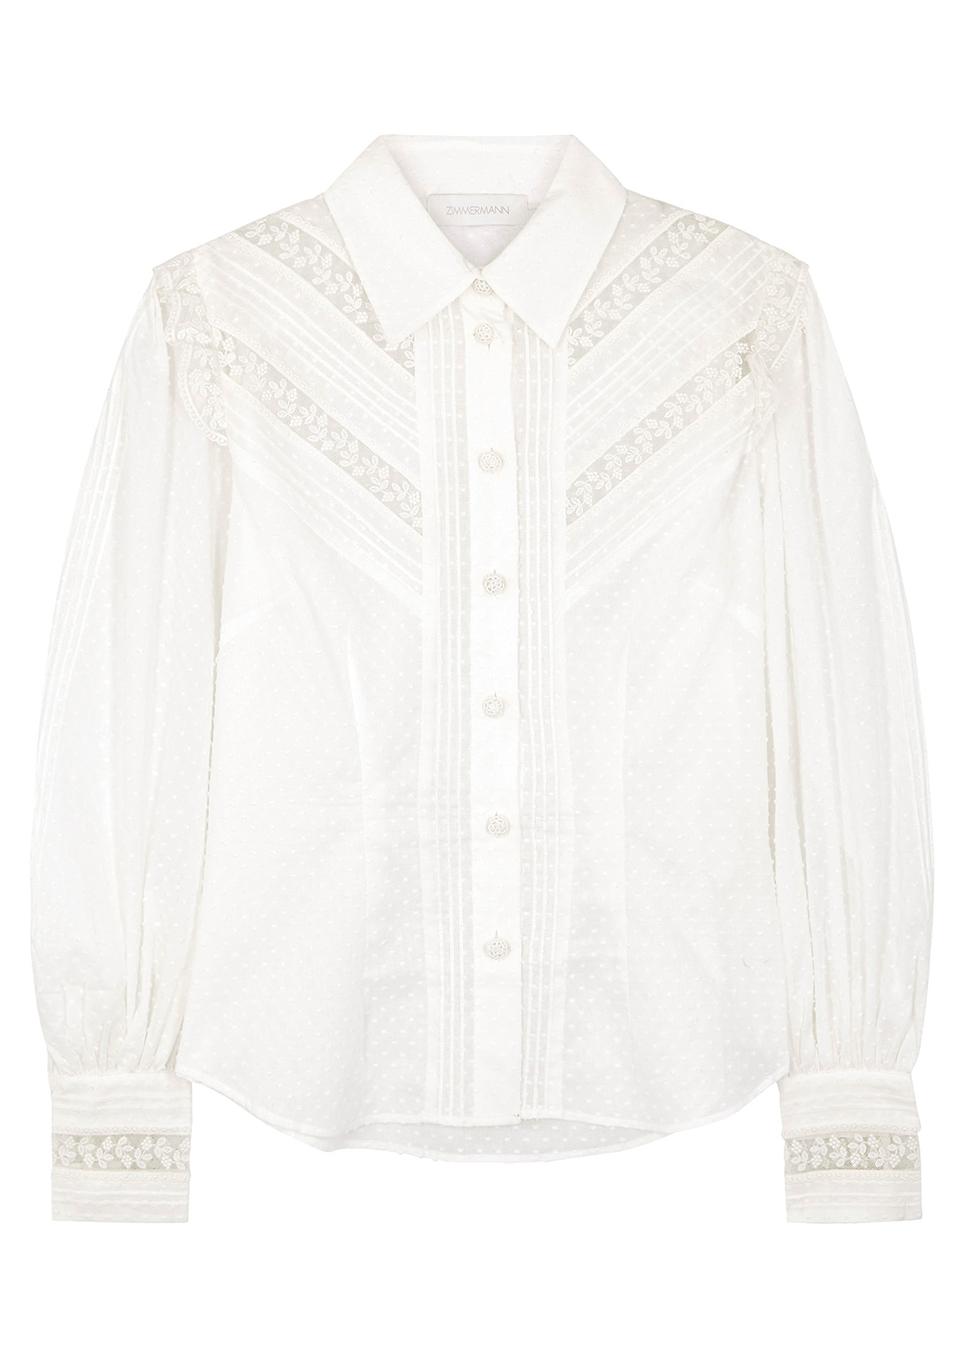 3ecdc1b553c Women's Designer Long-Sleeved Tops - Harvey Nichols